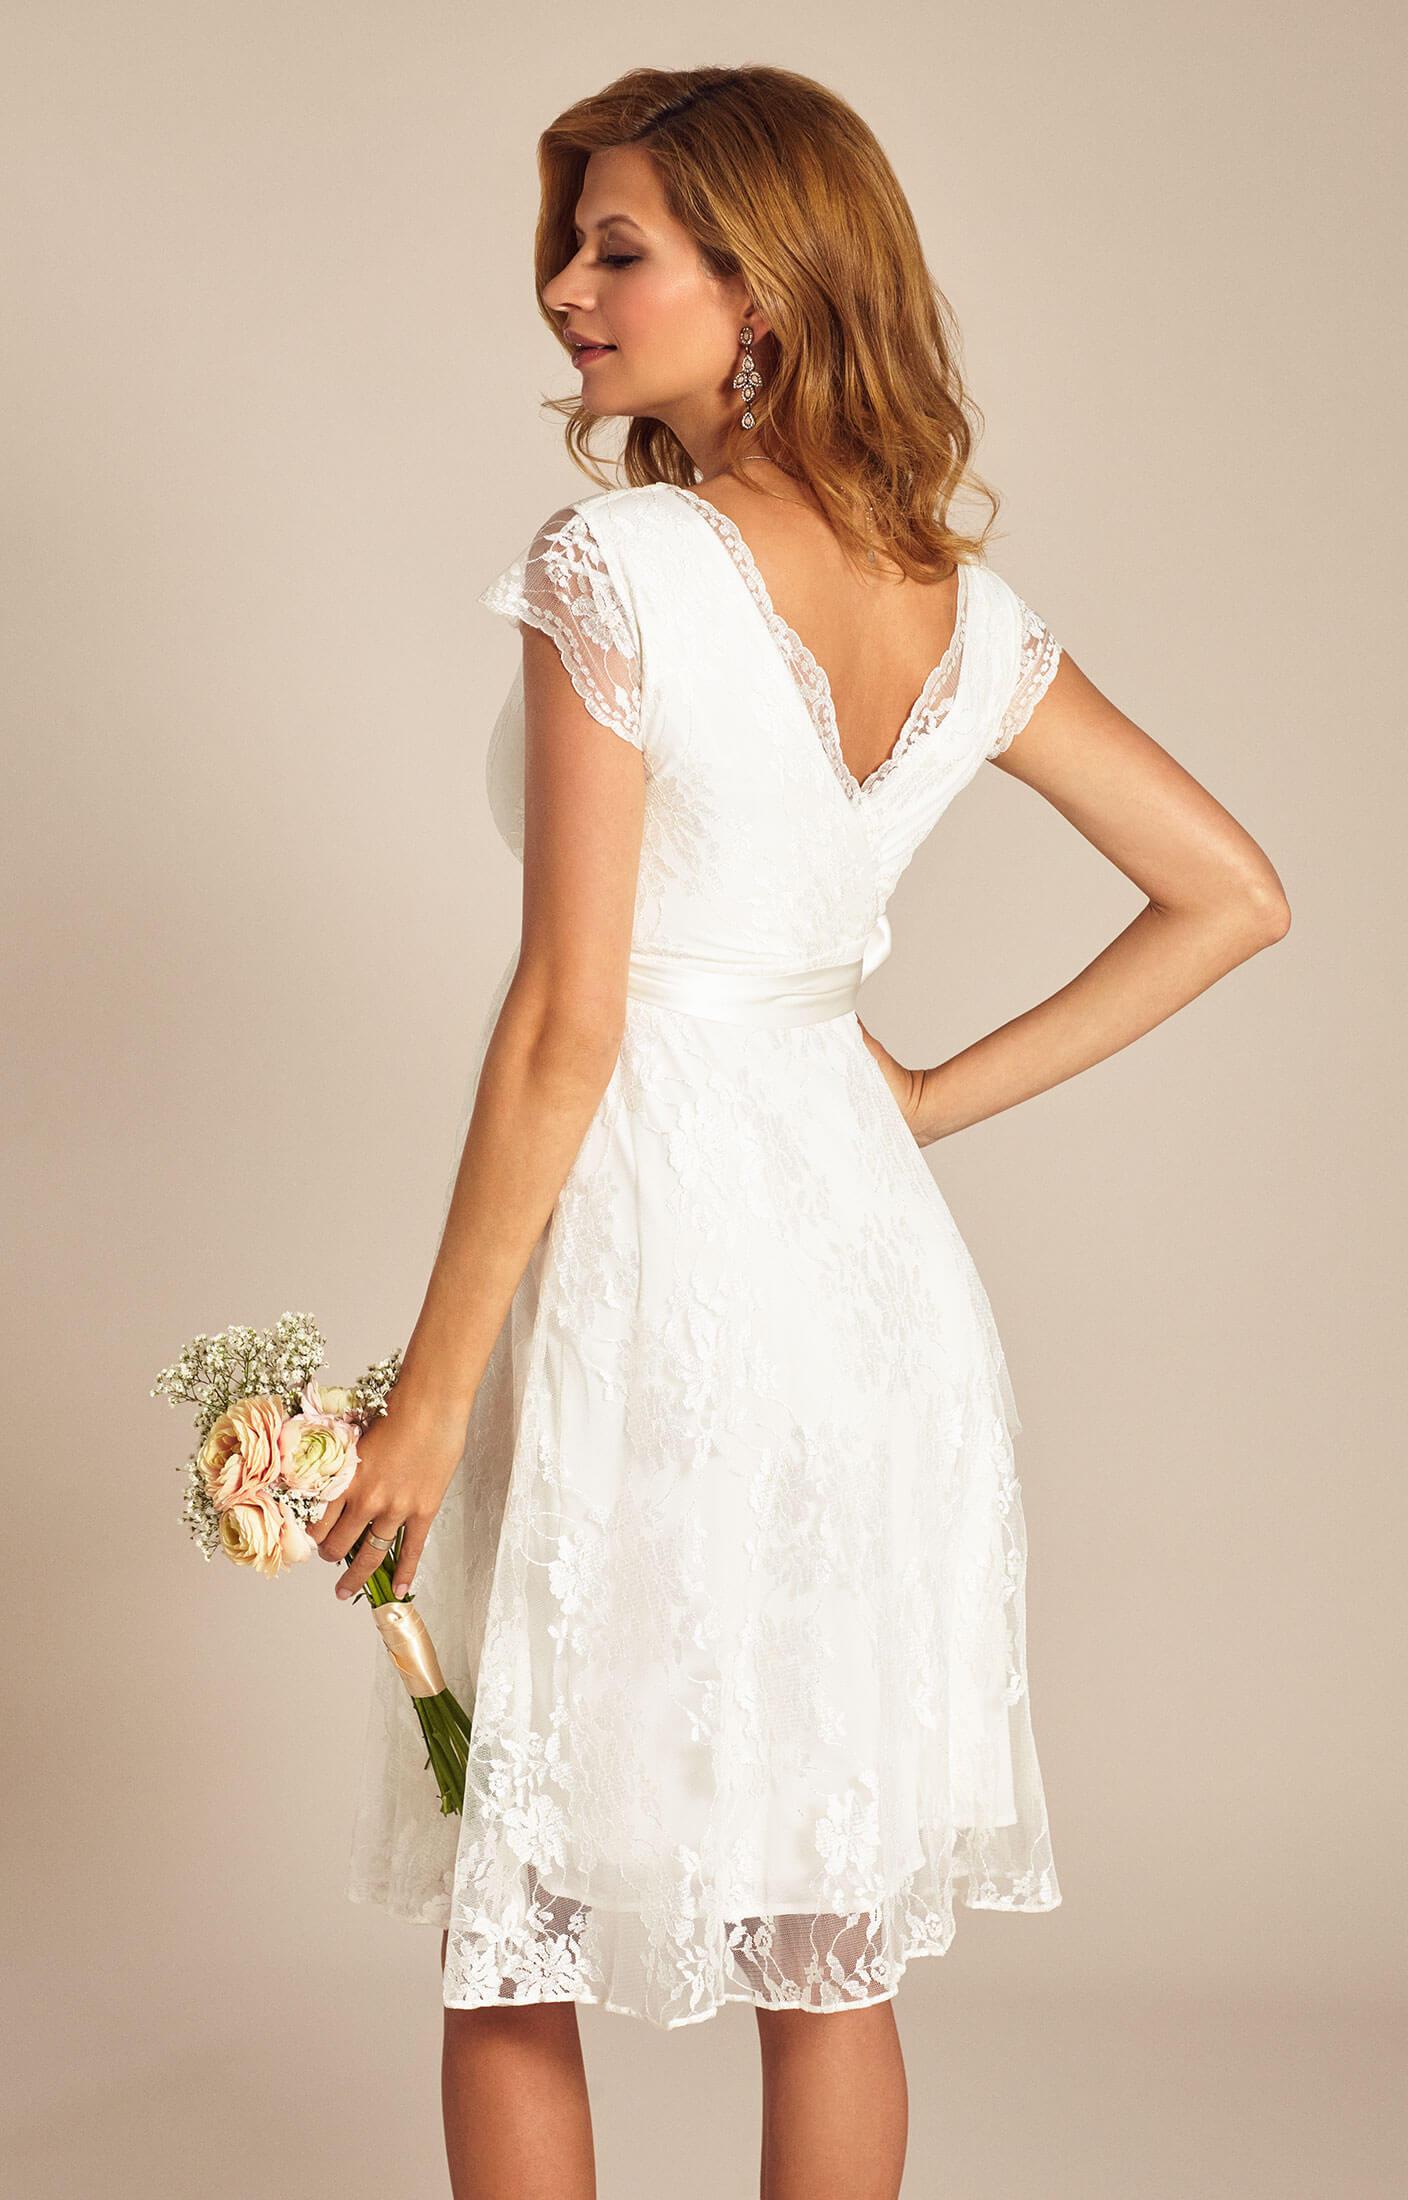 Designer Großartig Abendkleid Ivory Design15 Wunderbar Abendkleid Ivory Design